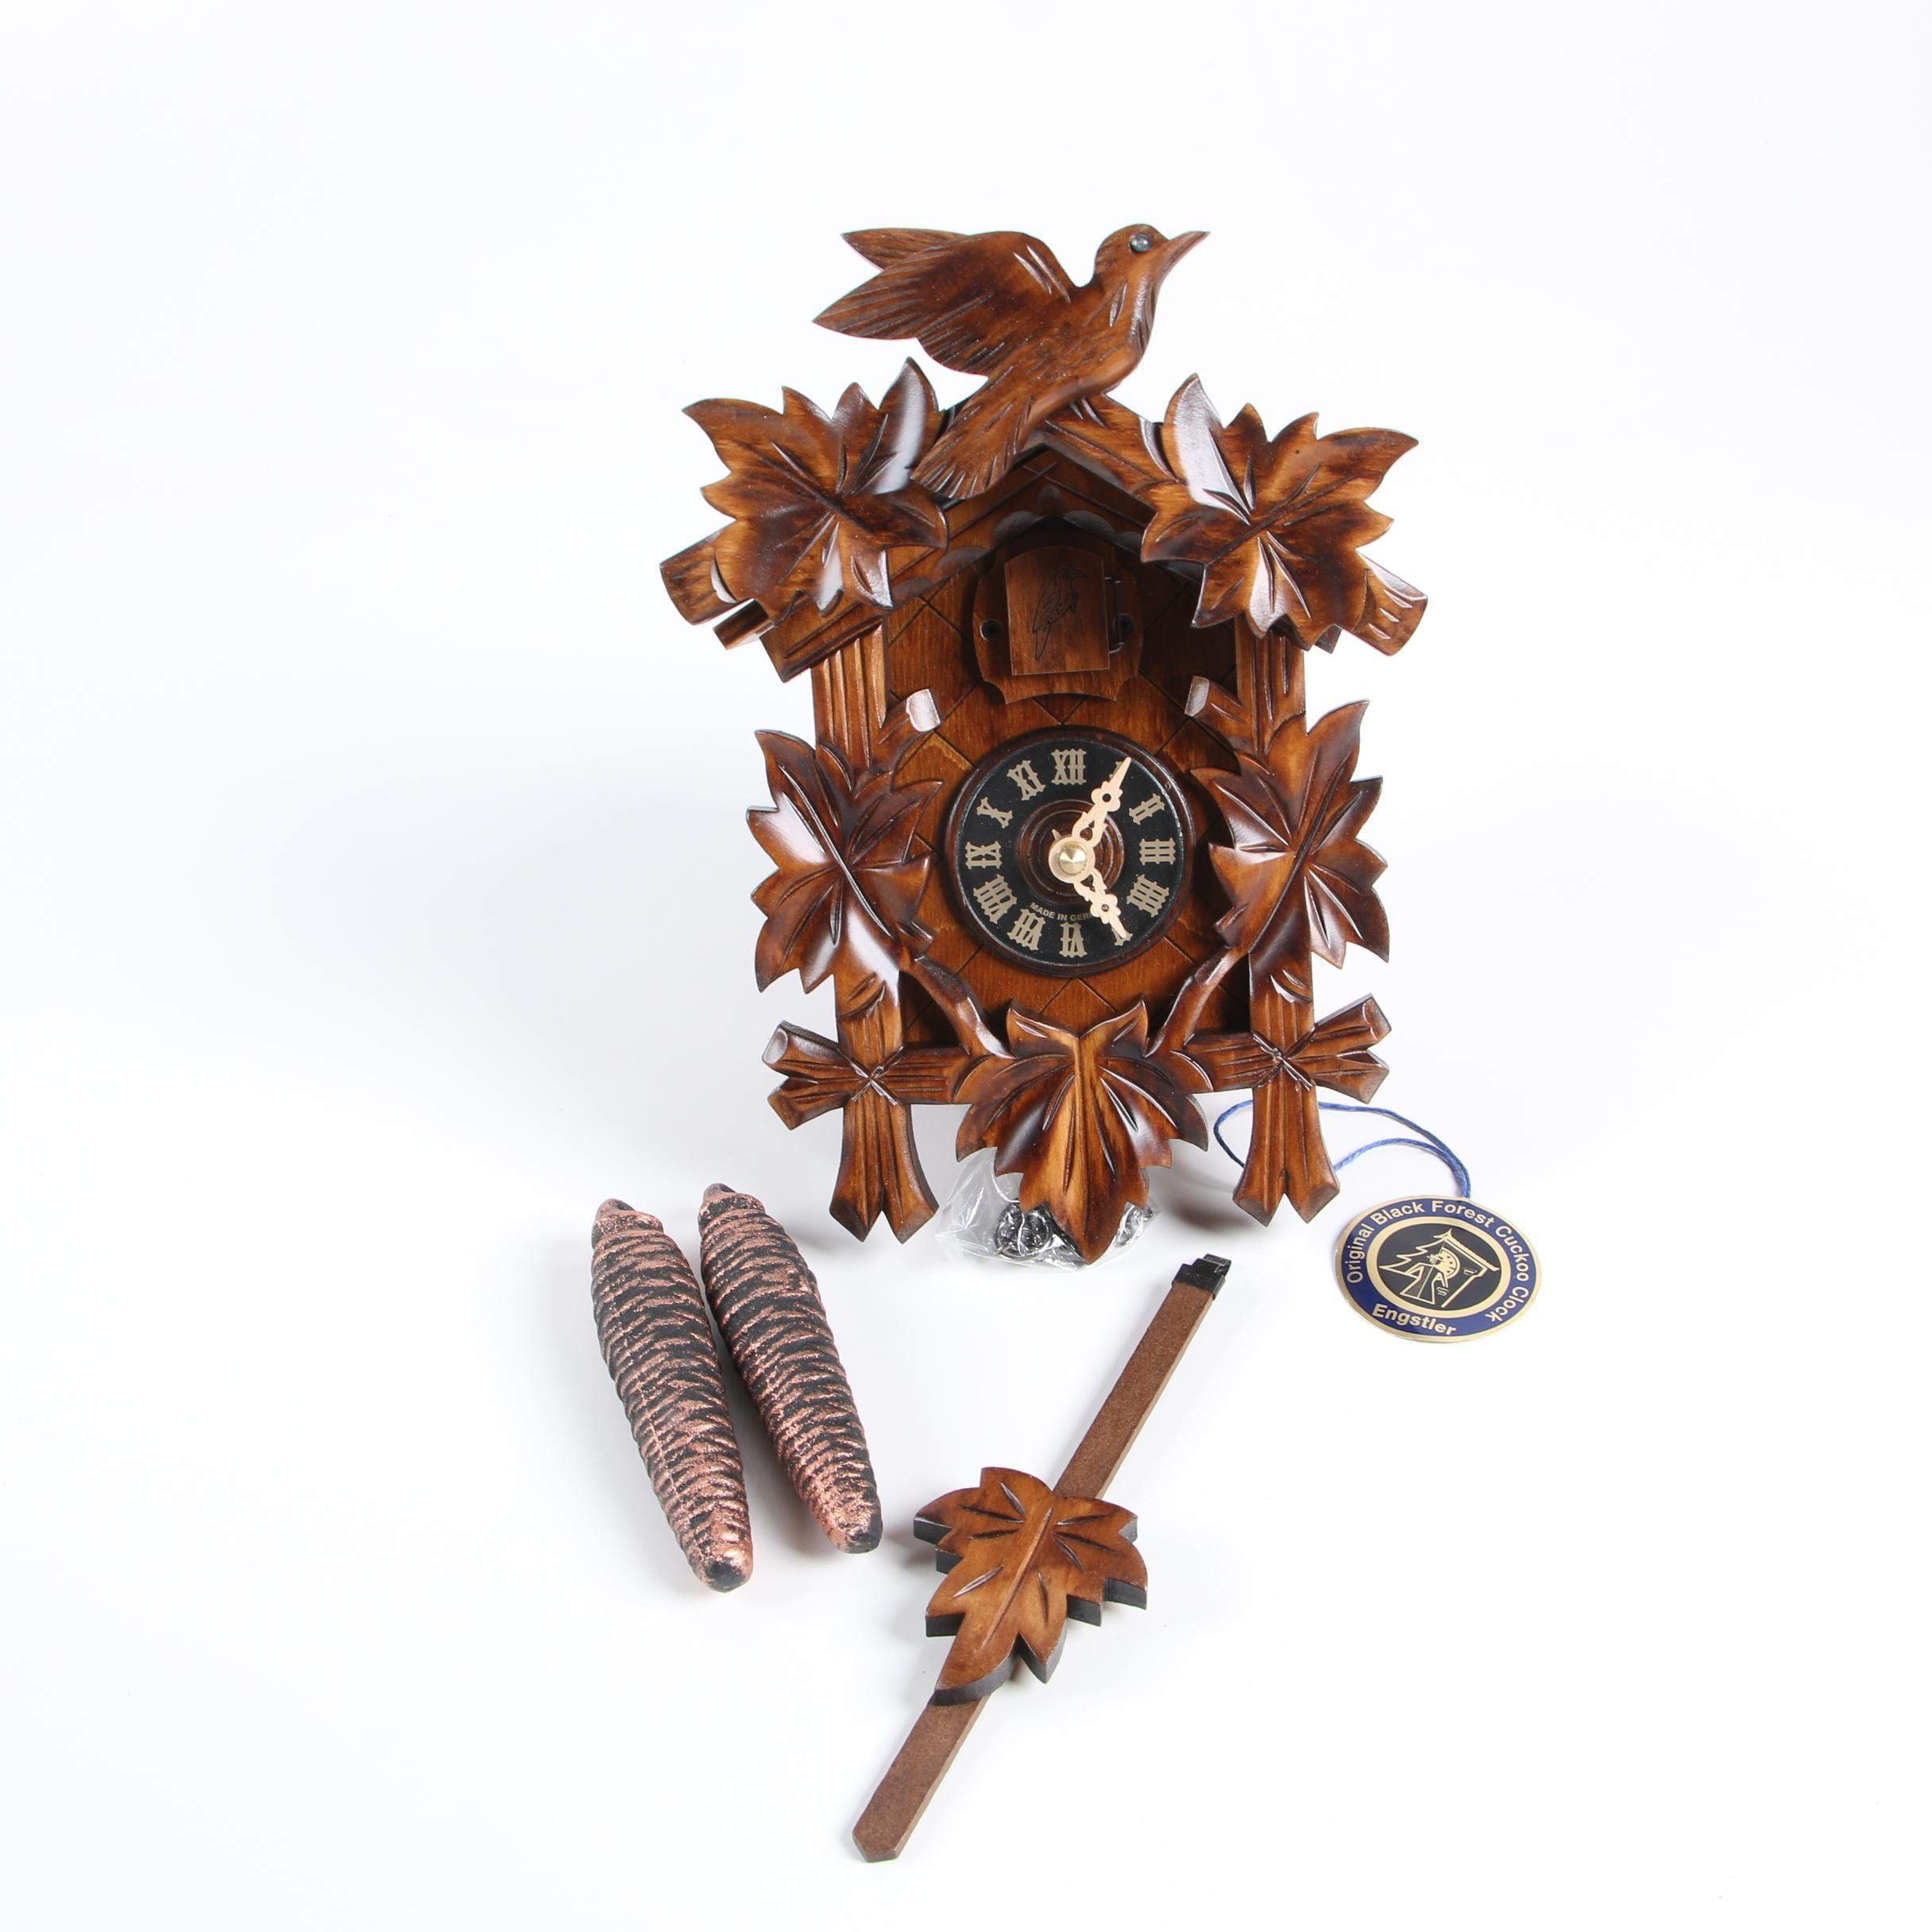 Engstler Kuckuckuhren Black Forest Cuckoo Clock with Walnut Finish